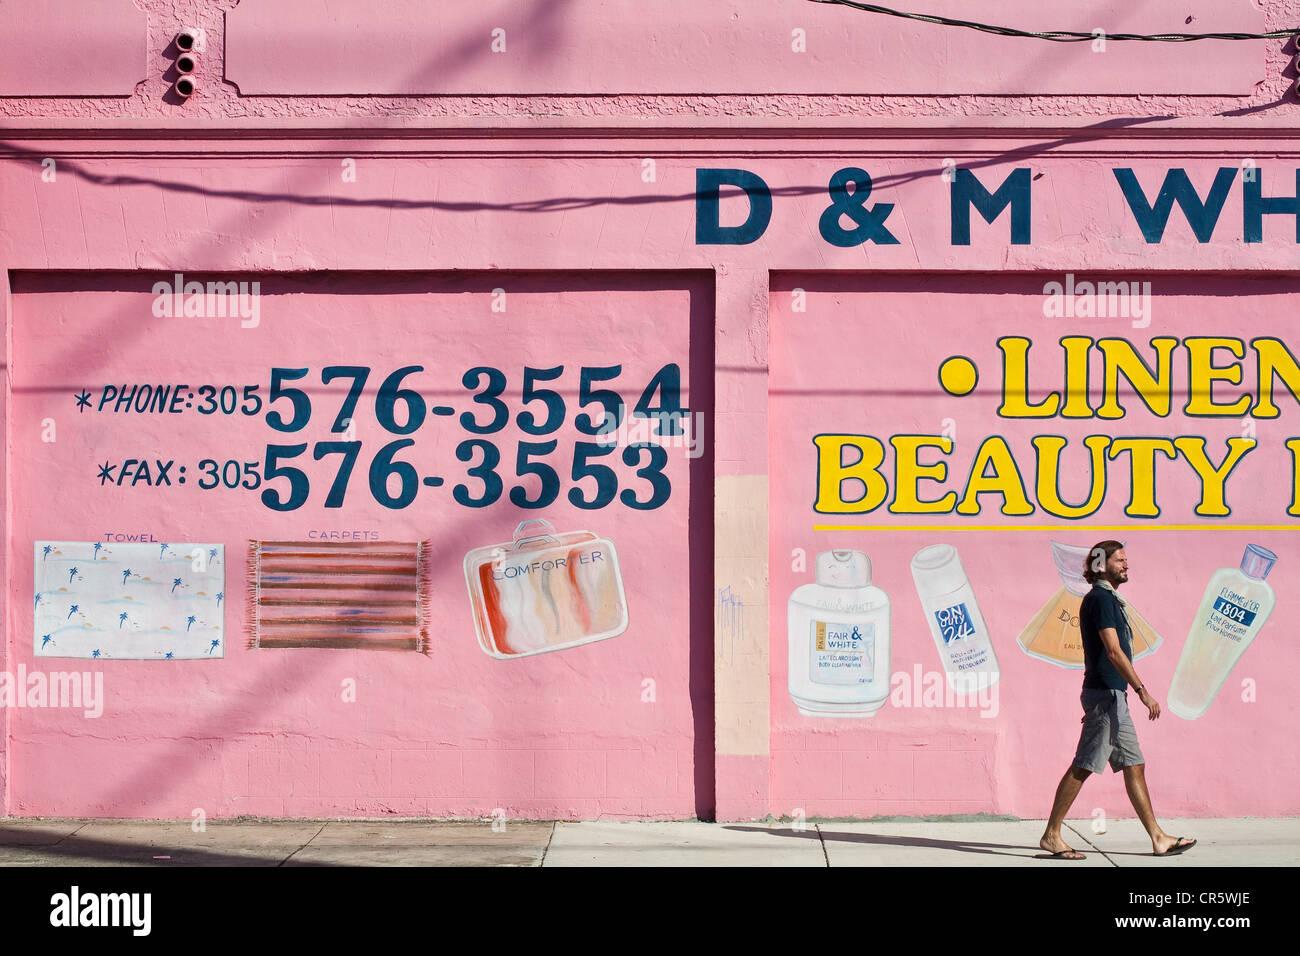 United States, Florida, Miami, Wynwood Art District, D&M Wholesale